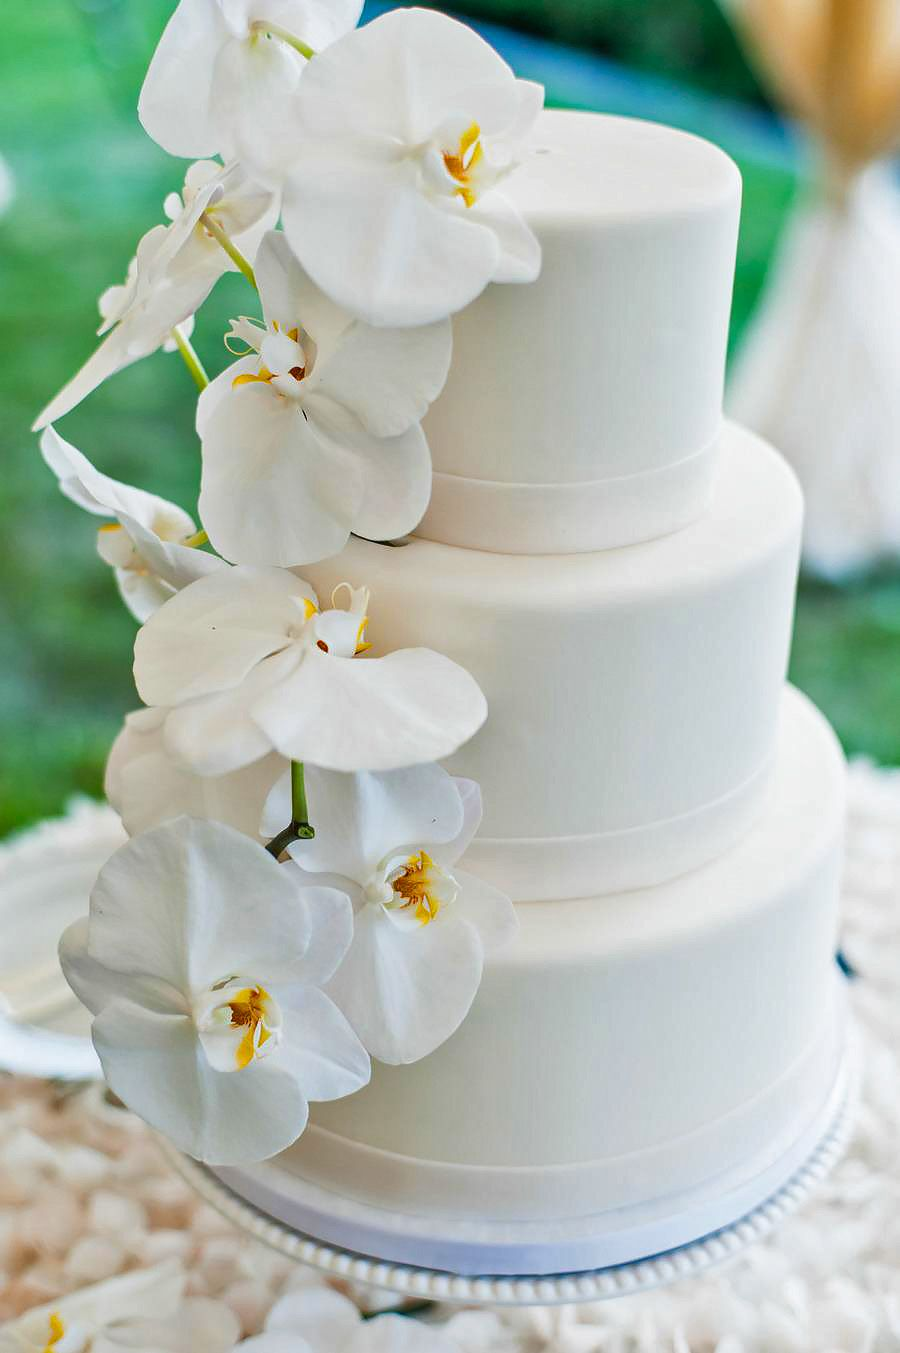 24 Tropical Wedding Cakes That Wow | Pinterest | Wedding cake, Cake ...